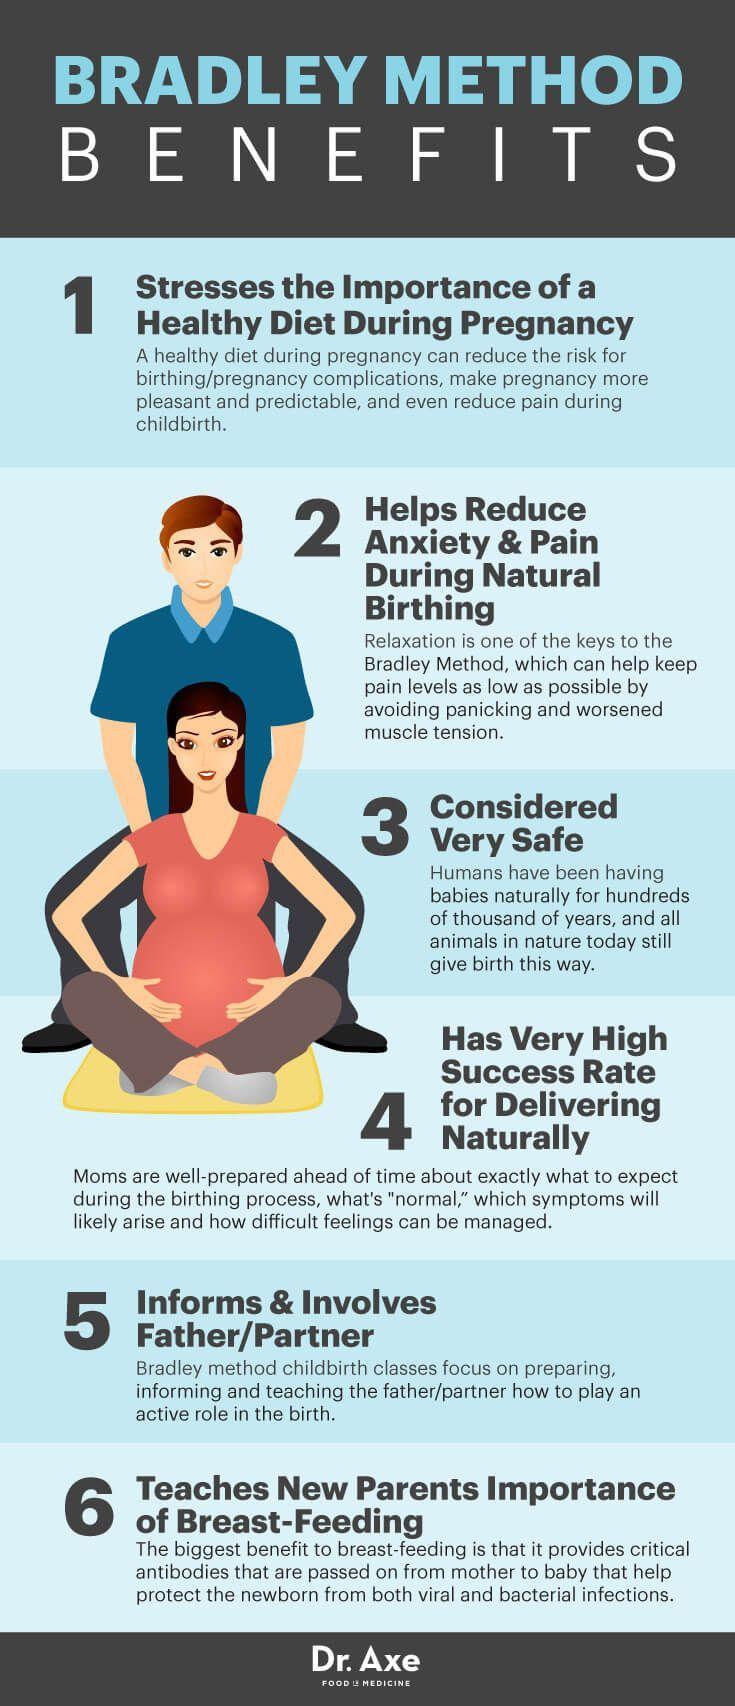 Bradley Method benefits - Dr. Axe www.draxe.com #health #holistic #natural